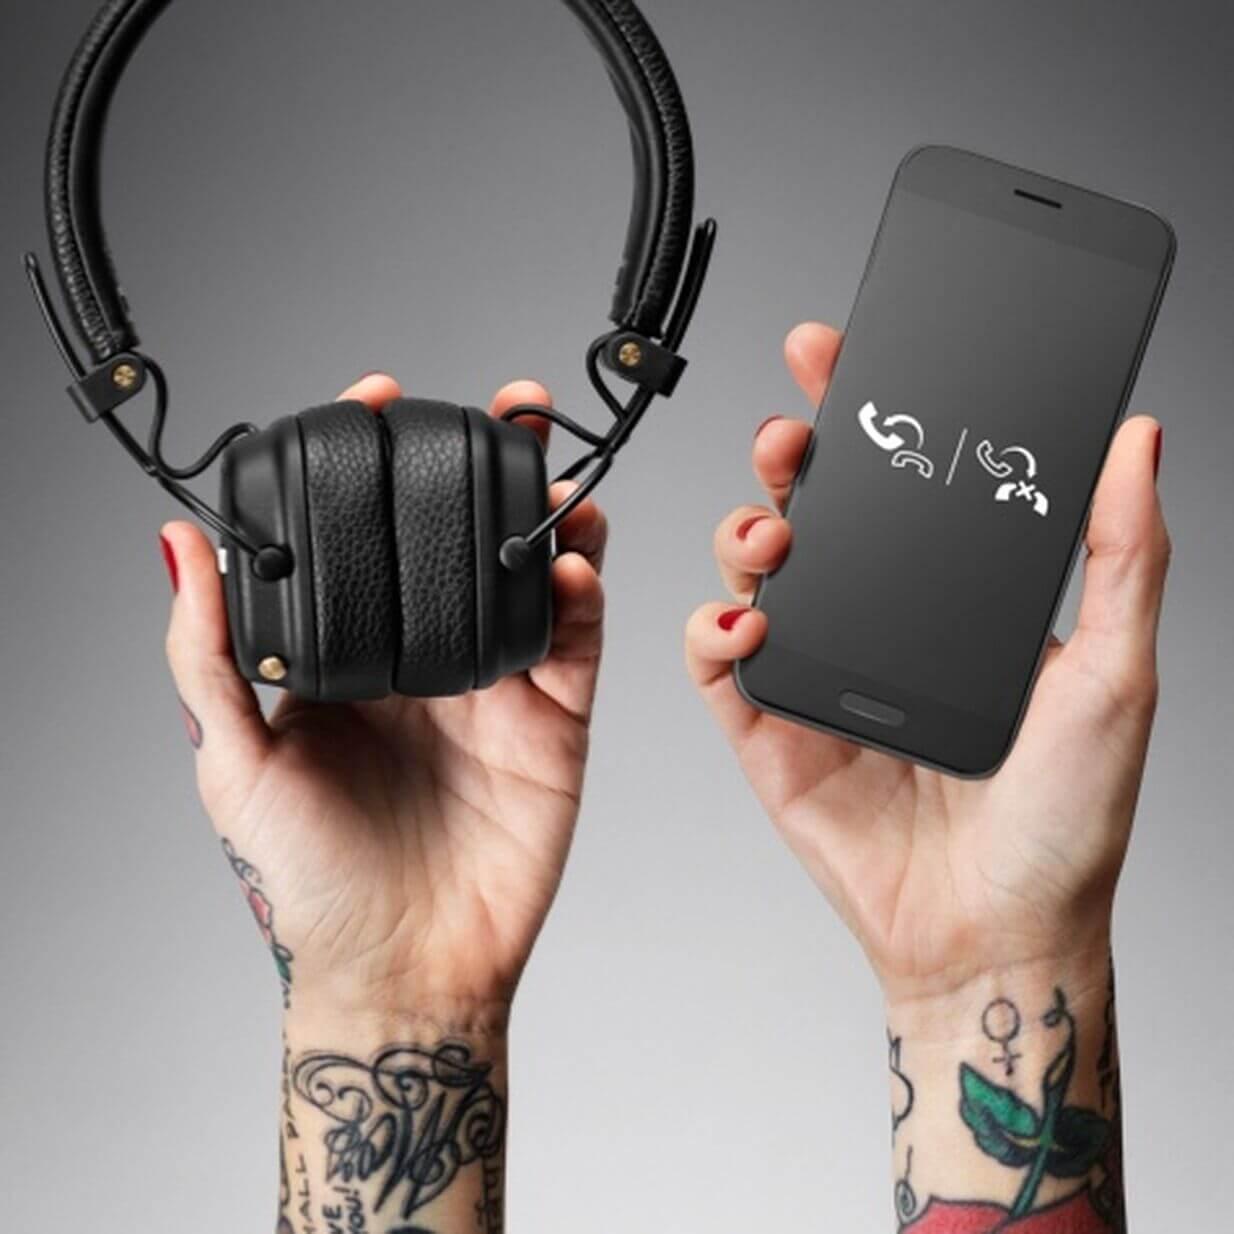 marshall major III boom headset price